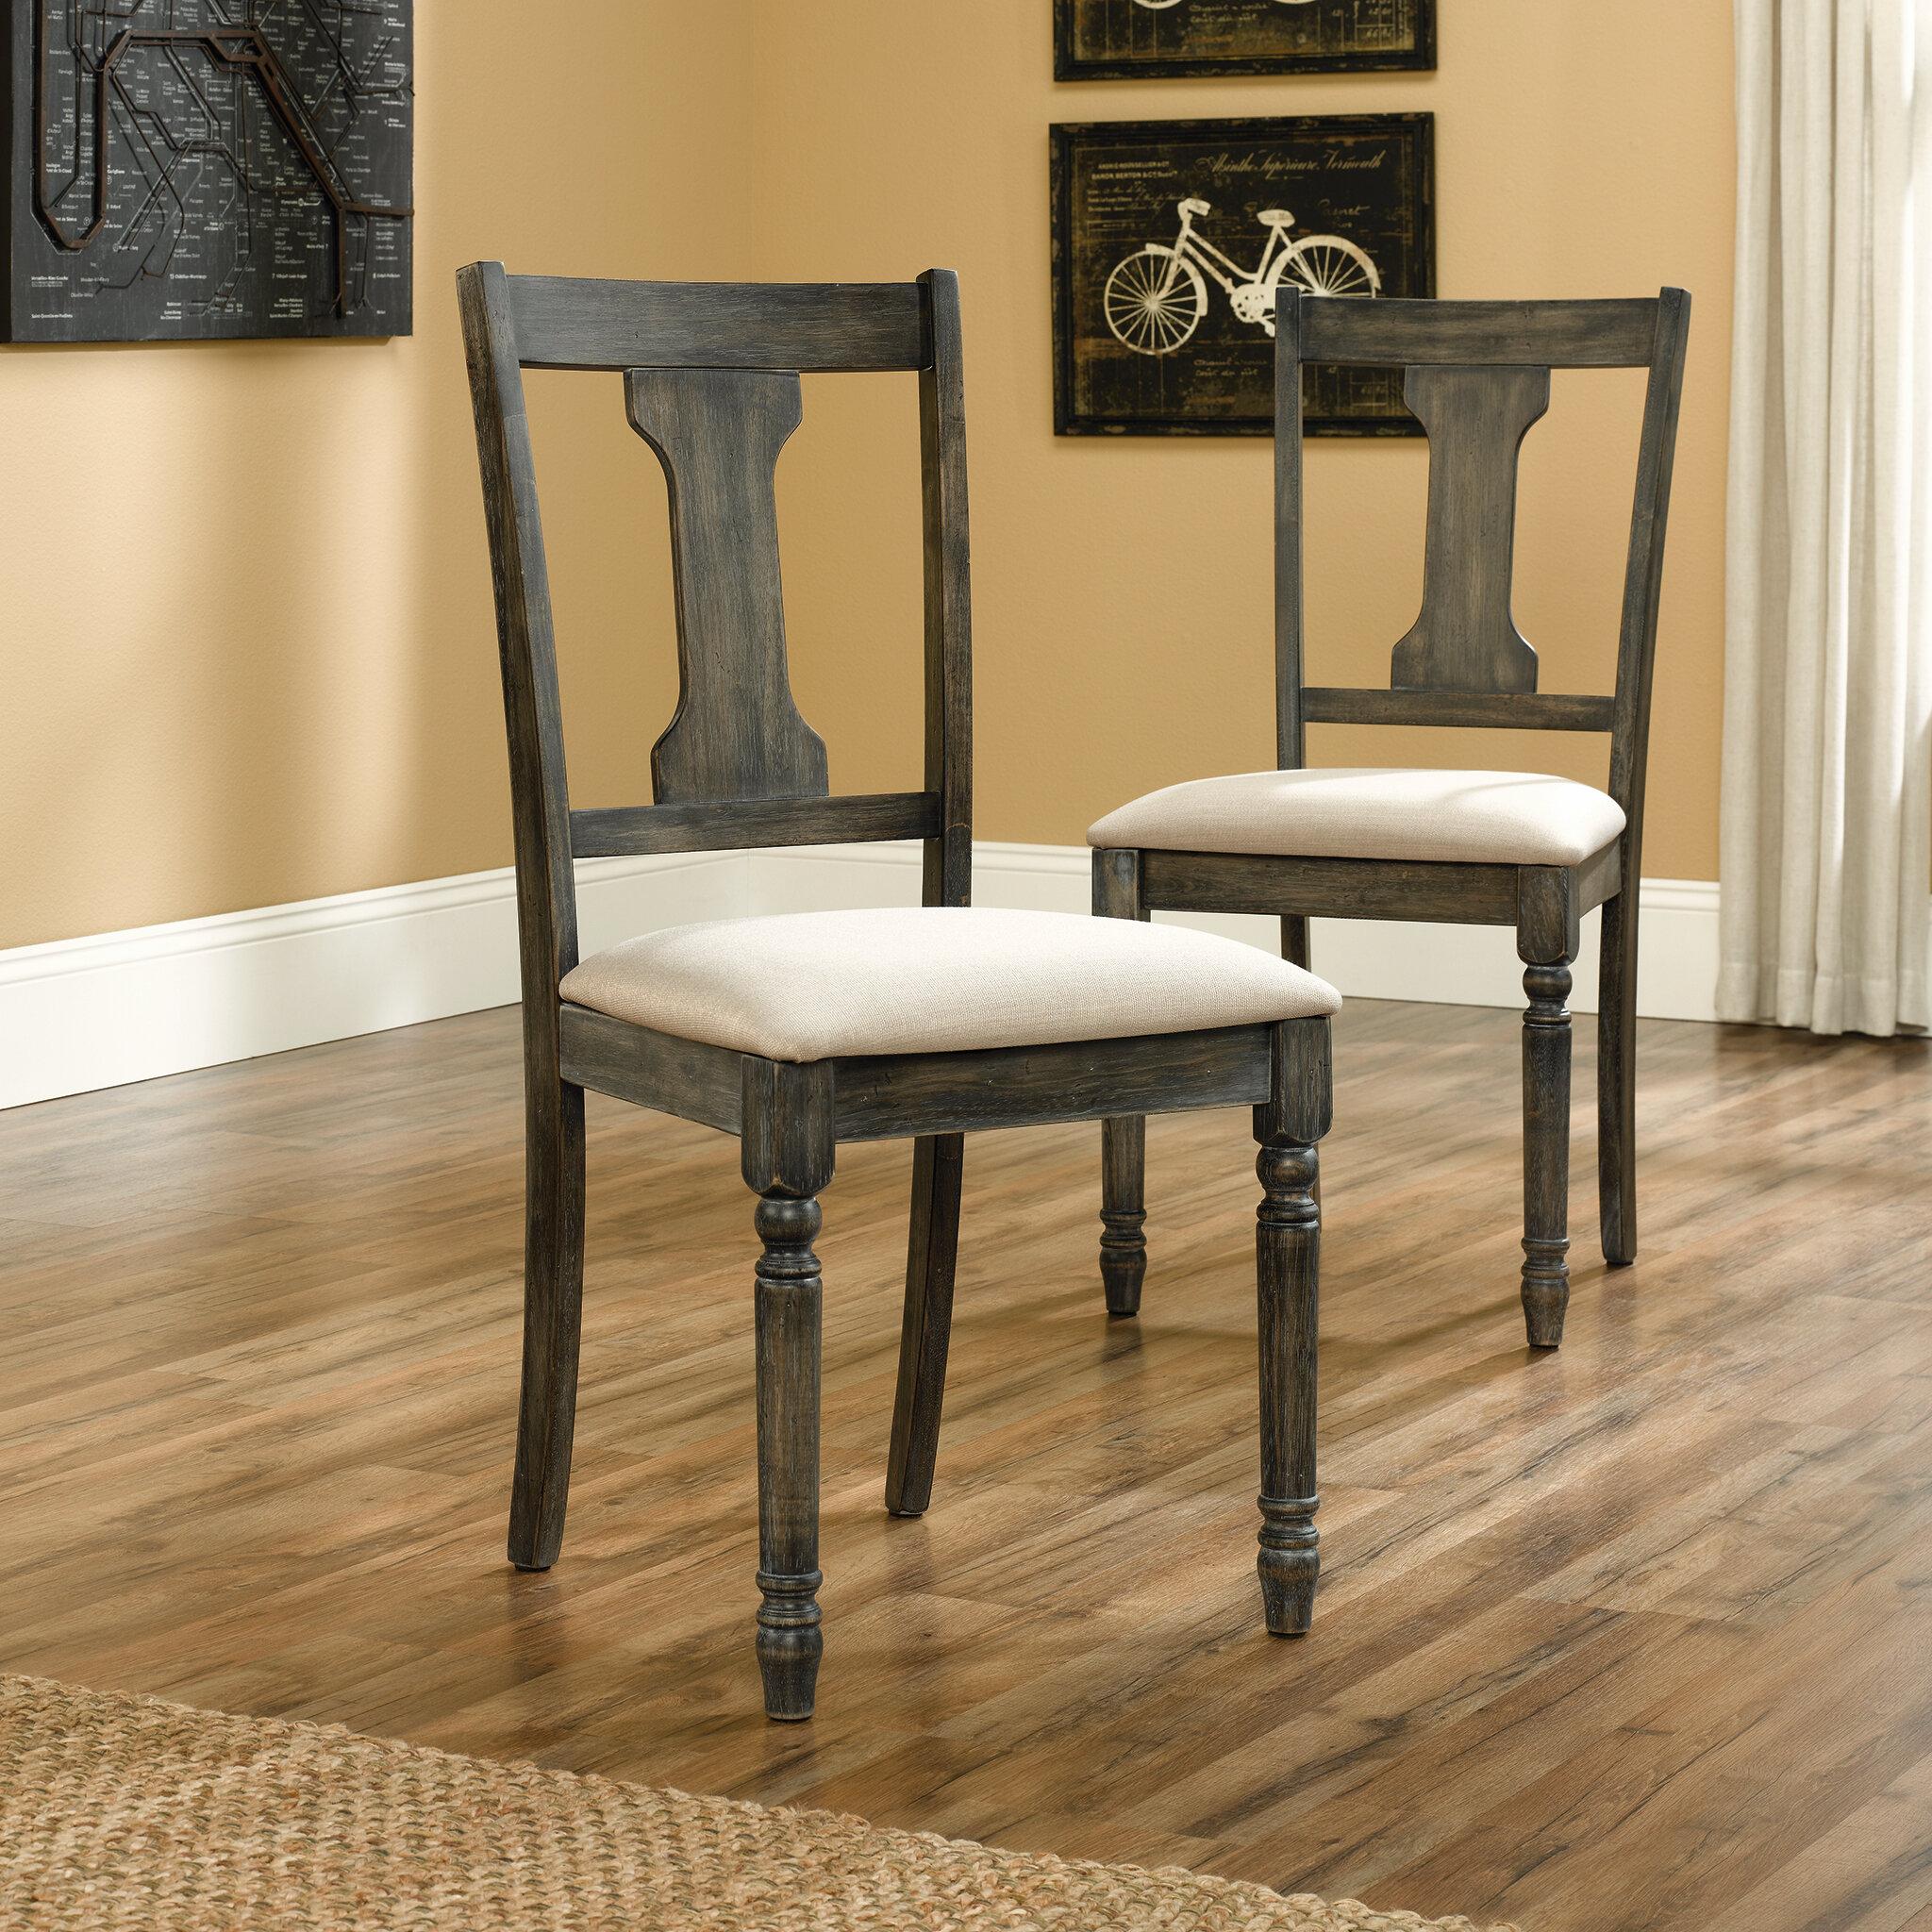 Stupendous August Grove Brie Upholstered Dining Chair Inzonedesignstudio Interior Chair Design Inzonedesignstudiocom